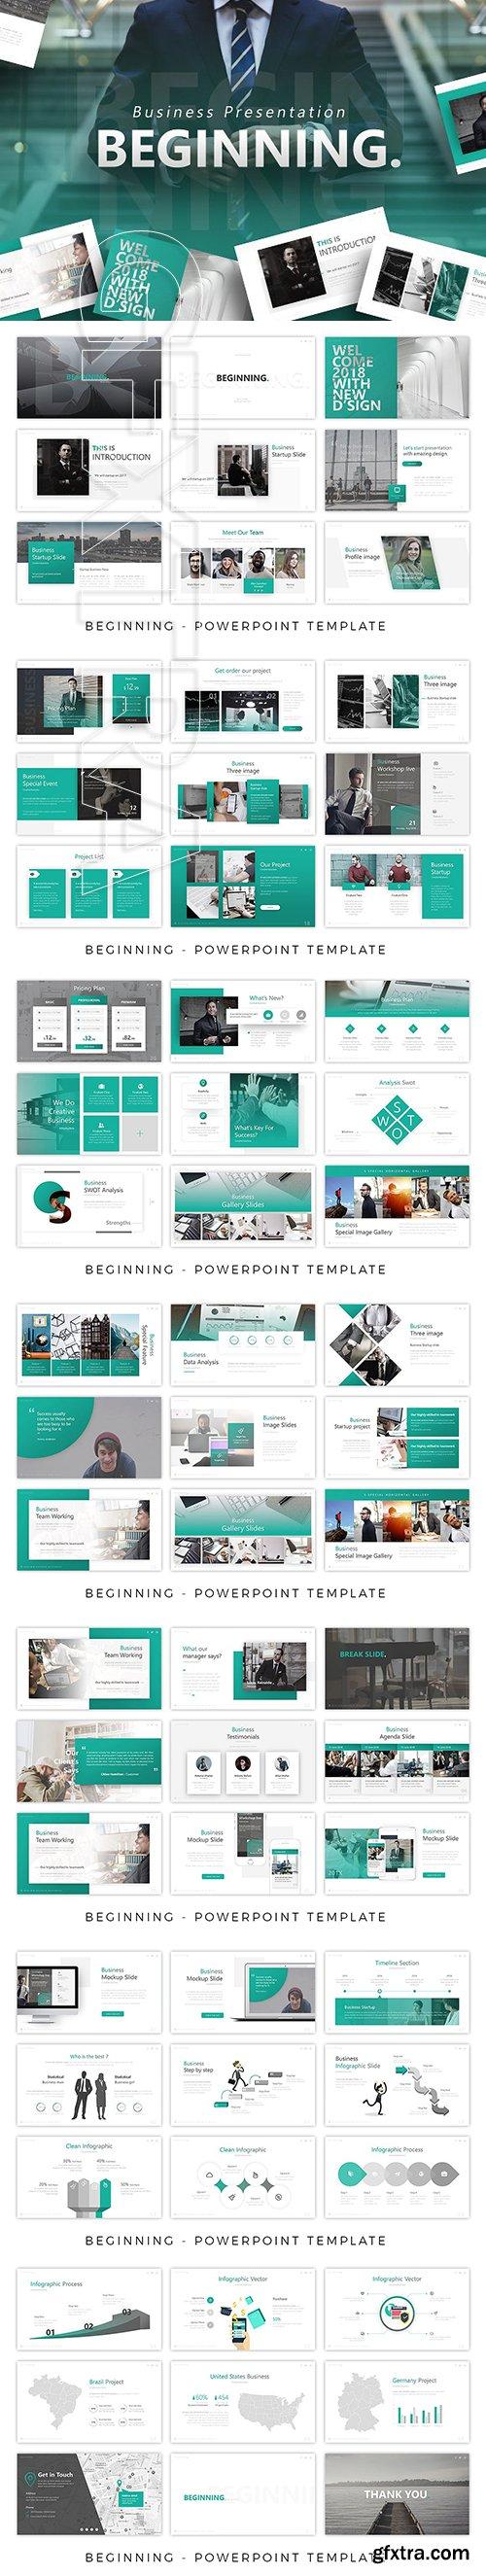 Beginning - Business Presentation